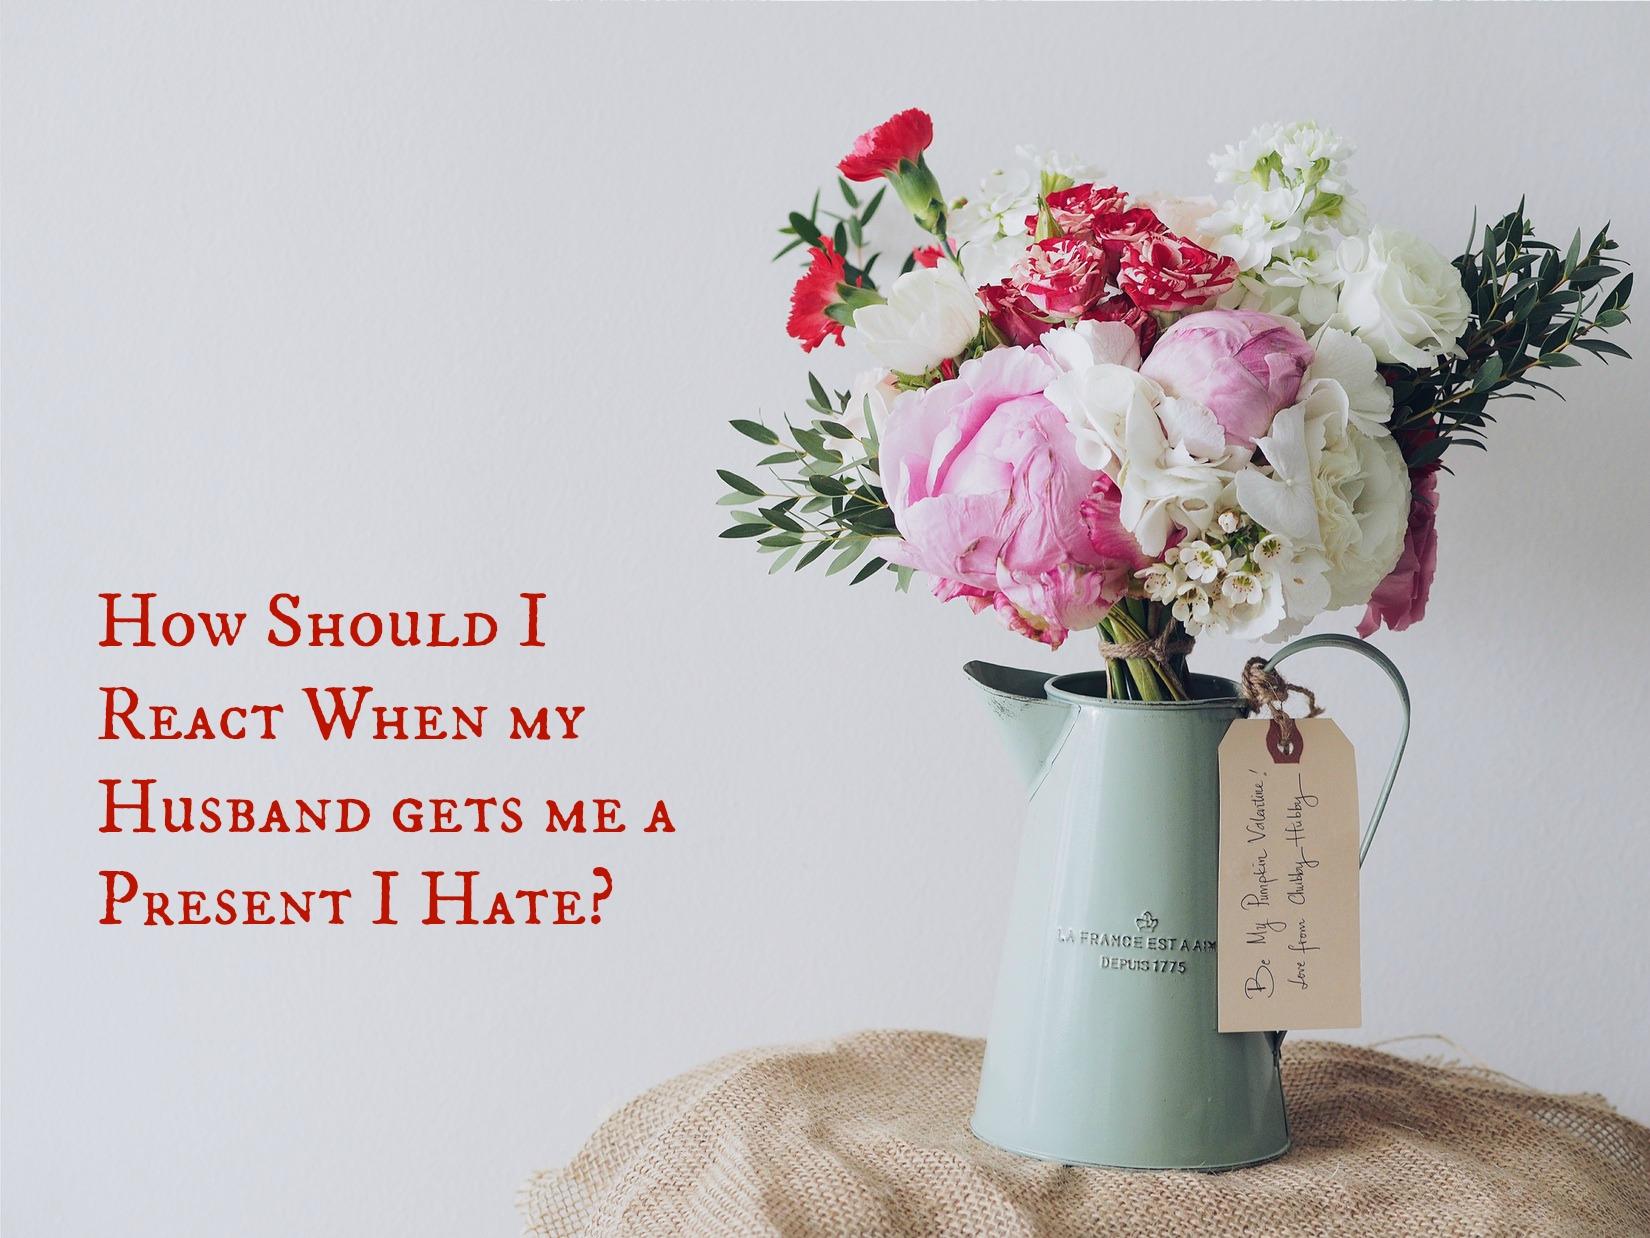 How Should I React When my Husband gets me a Present I Hate